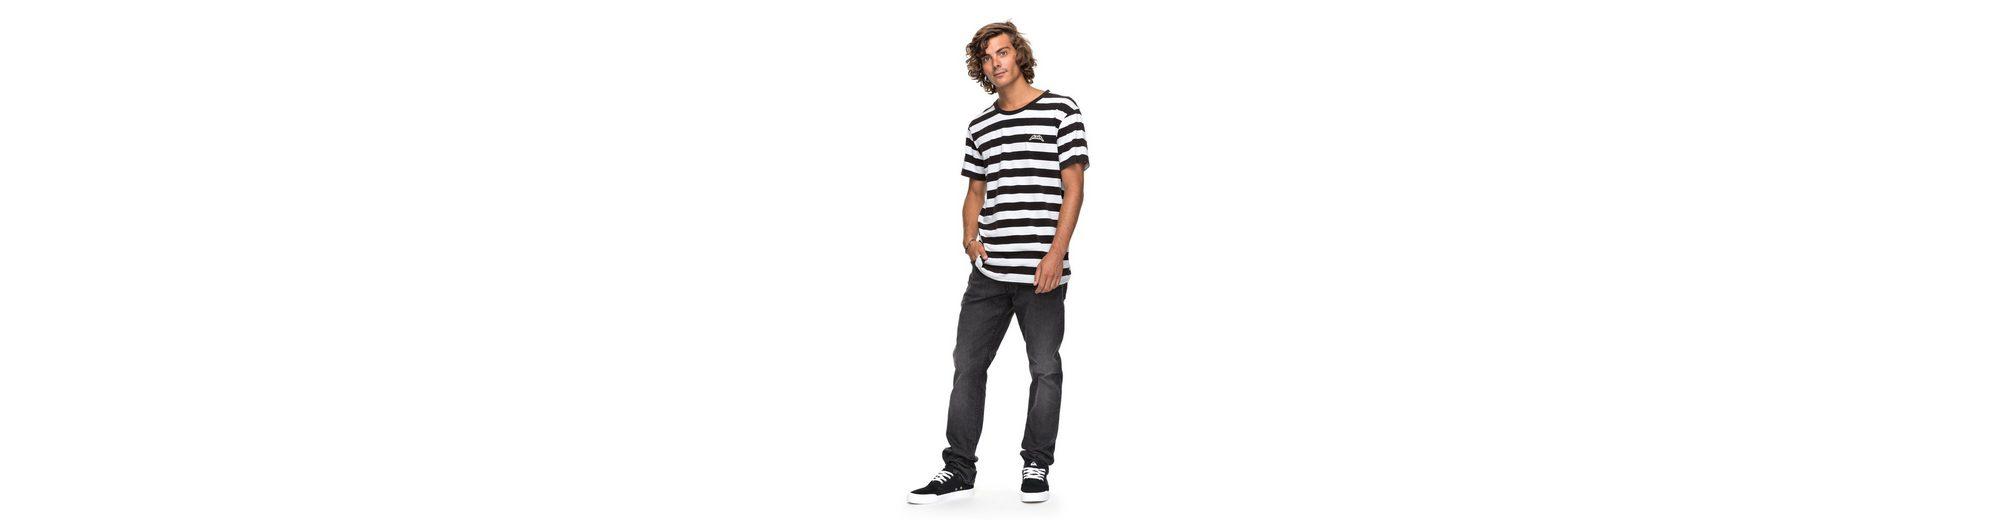 Bester Ort Verkauf Eastbay Quiksilver Slim Fit Jeans Distorsion Black 4T3SW